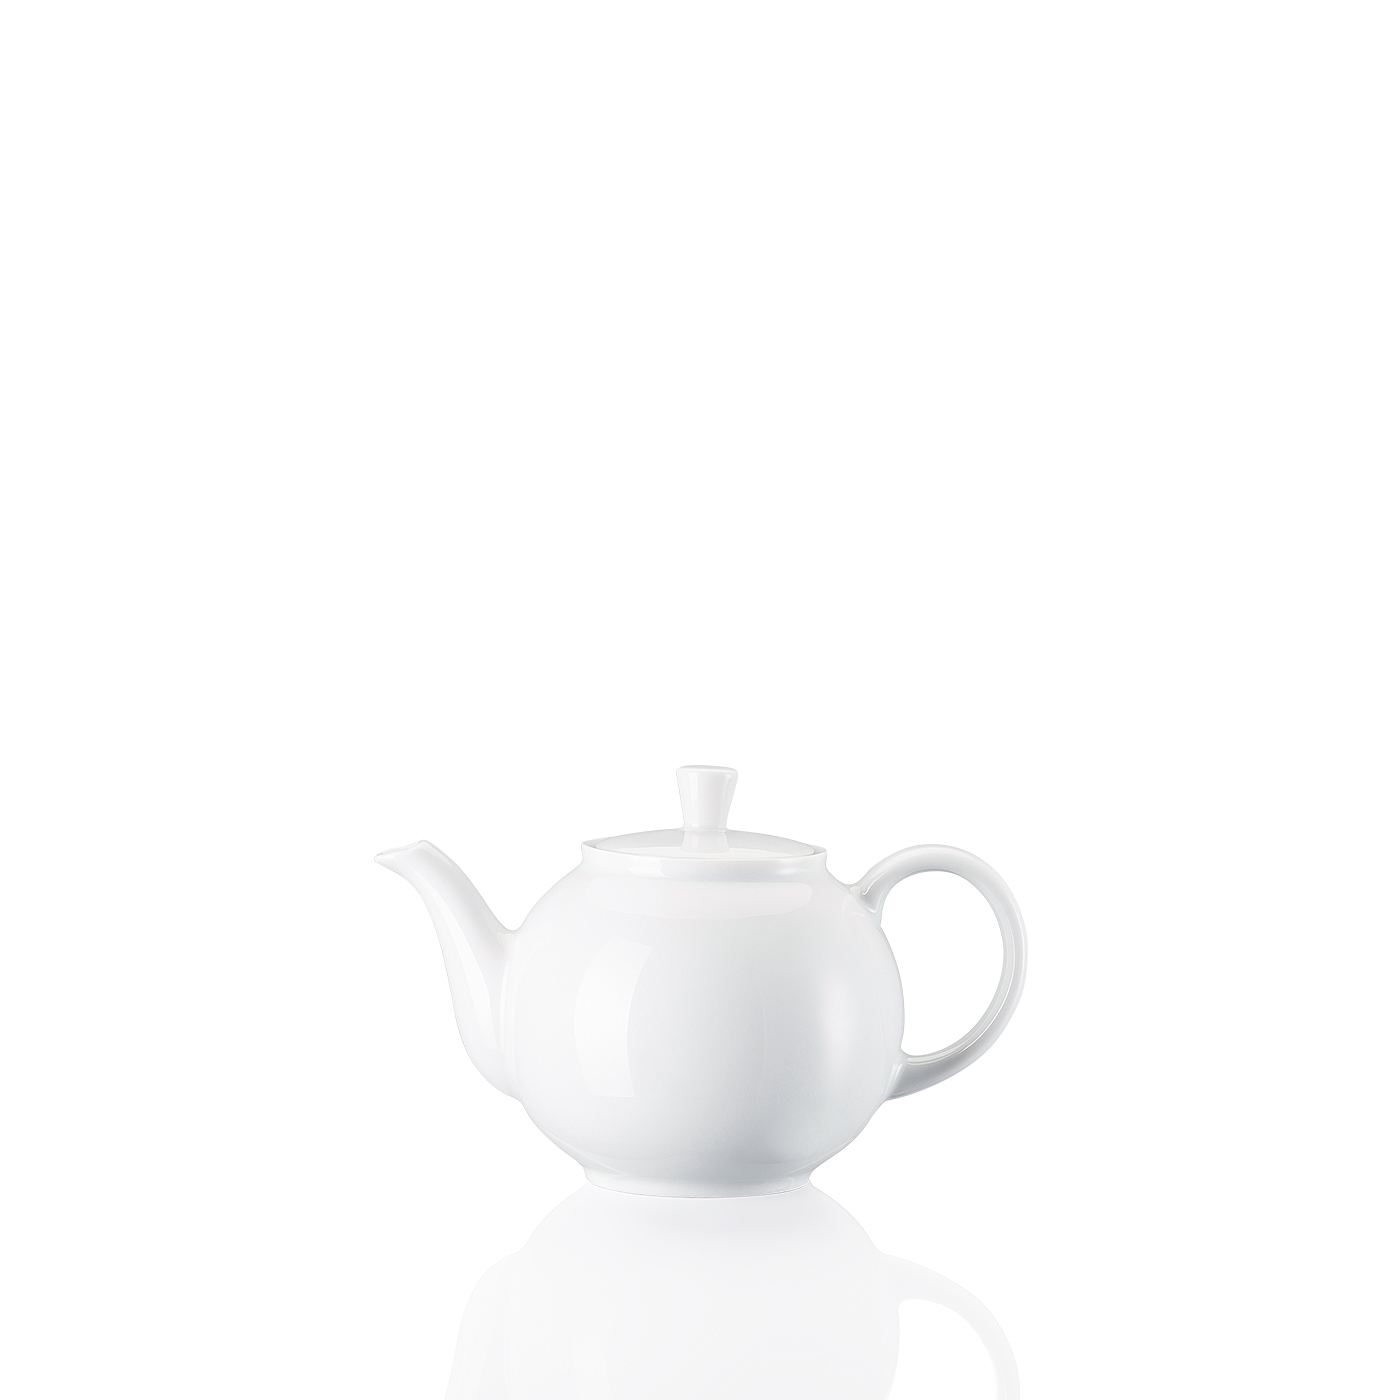 Teekanne 2 P. Form 1382 Weiss Arzberg